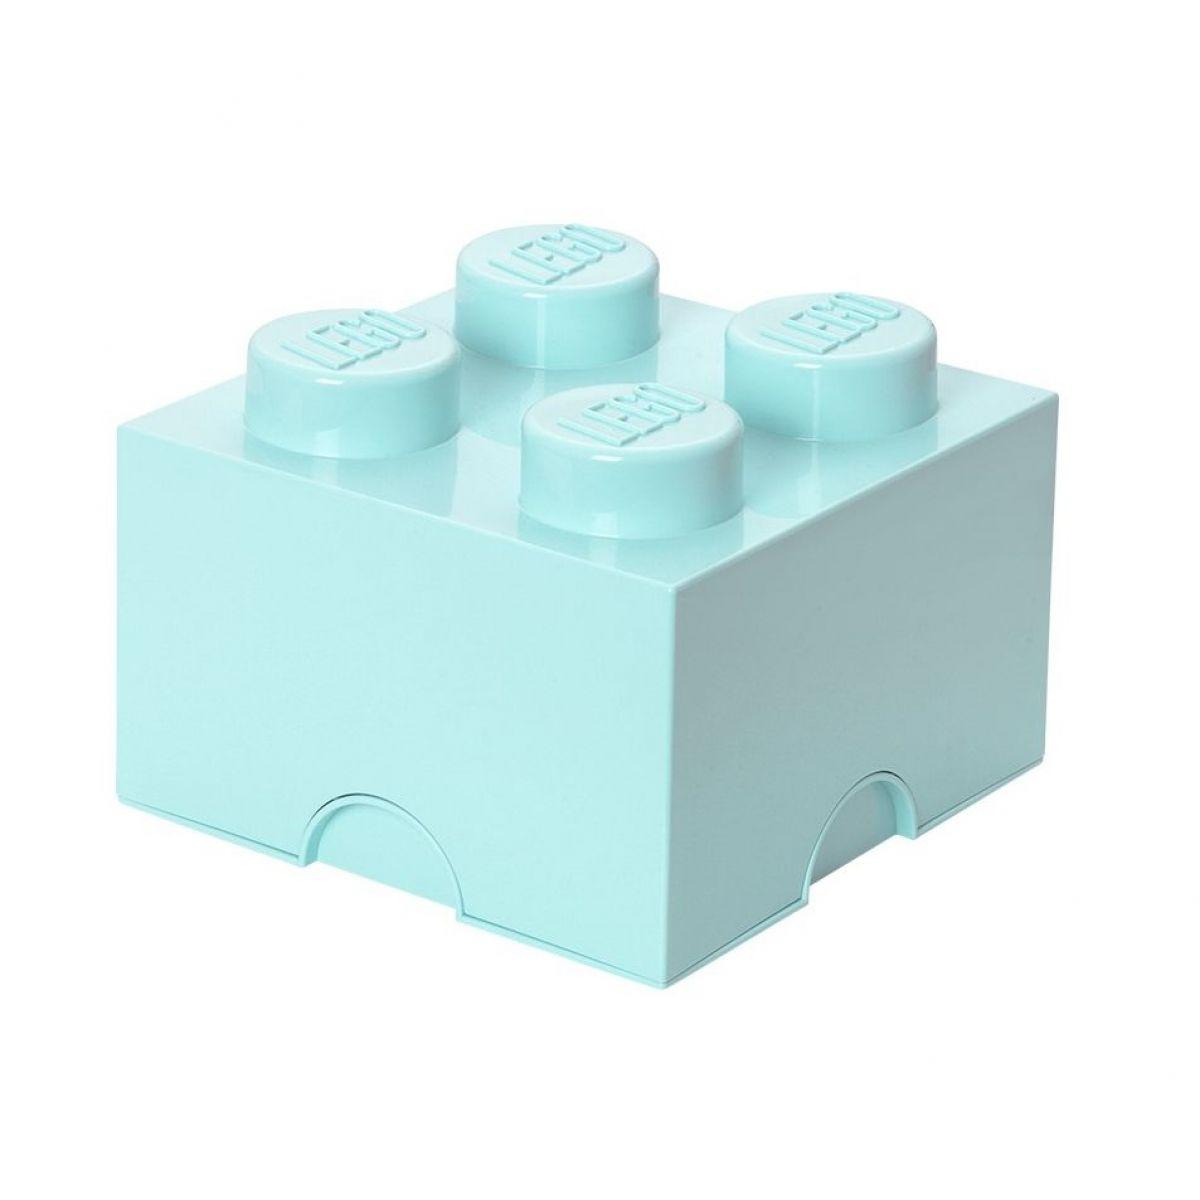 LEGO Úložný box 25x25x18cm Aqua